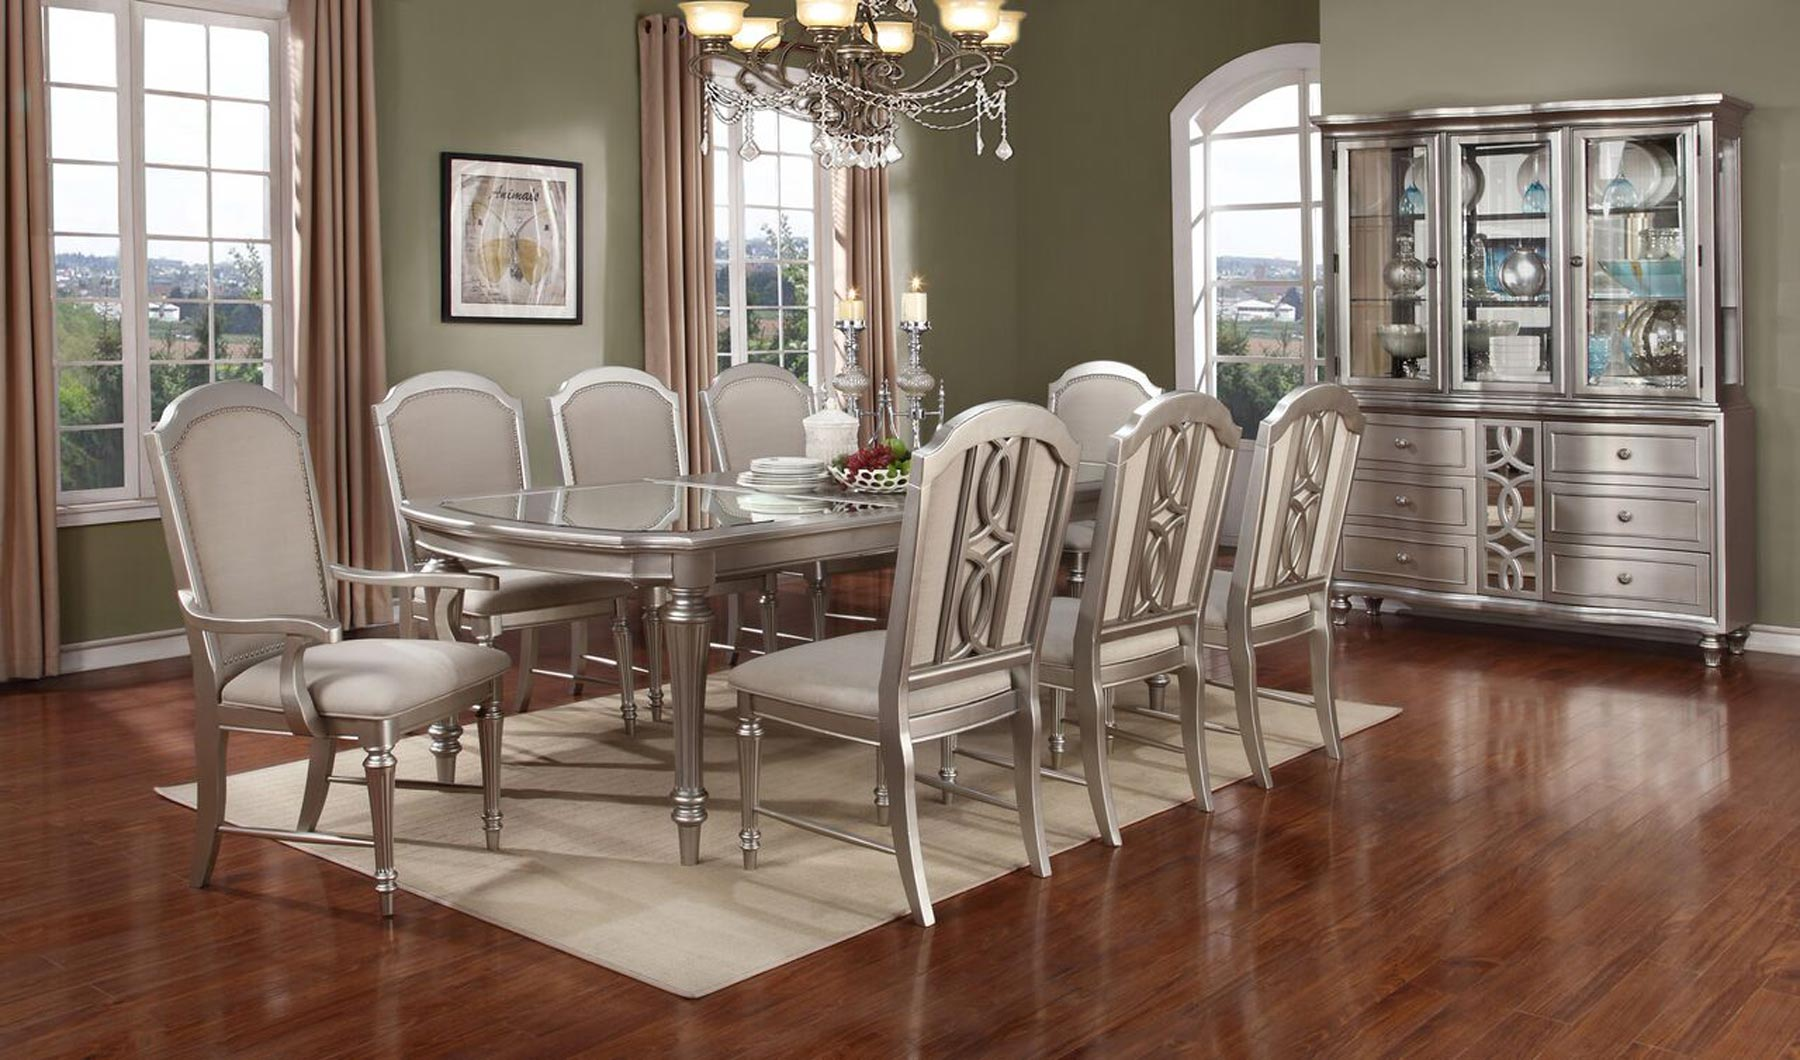 apartment dining room sets   Regency Park 7 Piece Dining Room Set   Gonzalez Furniture